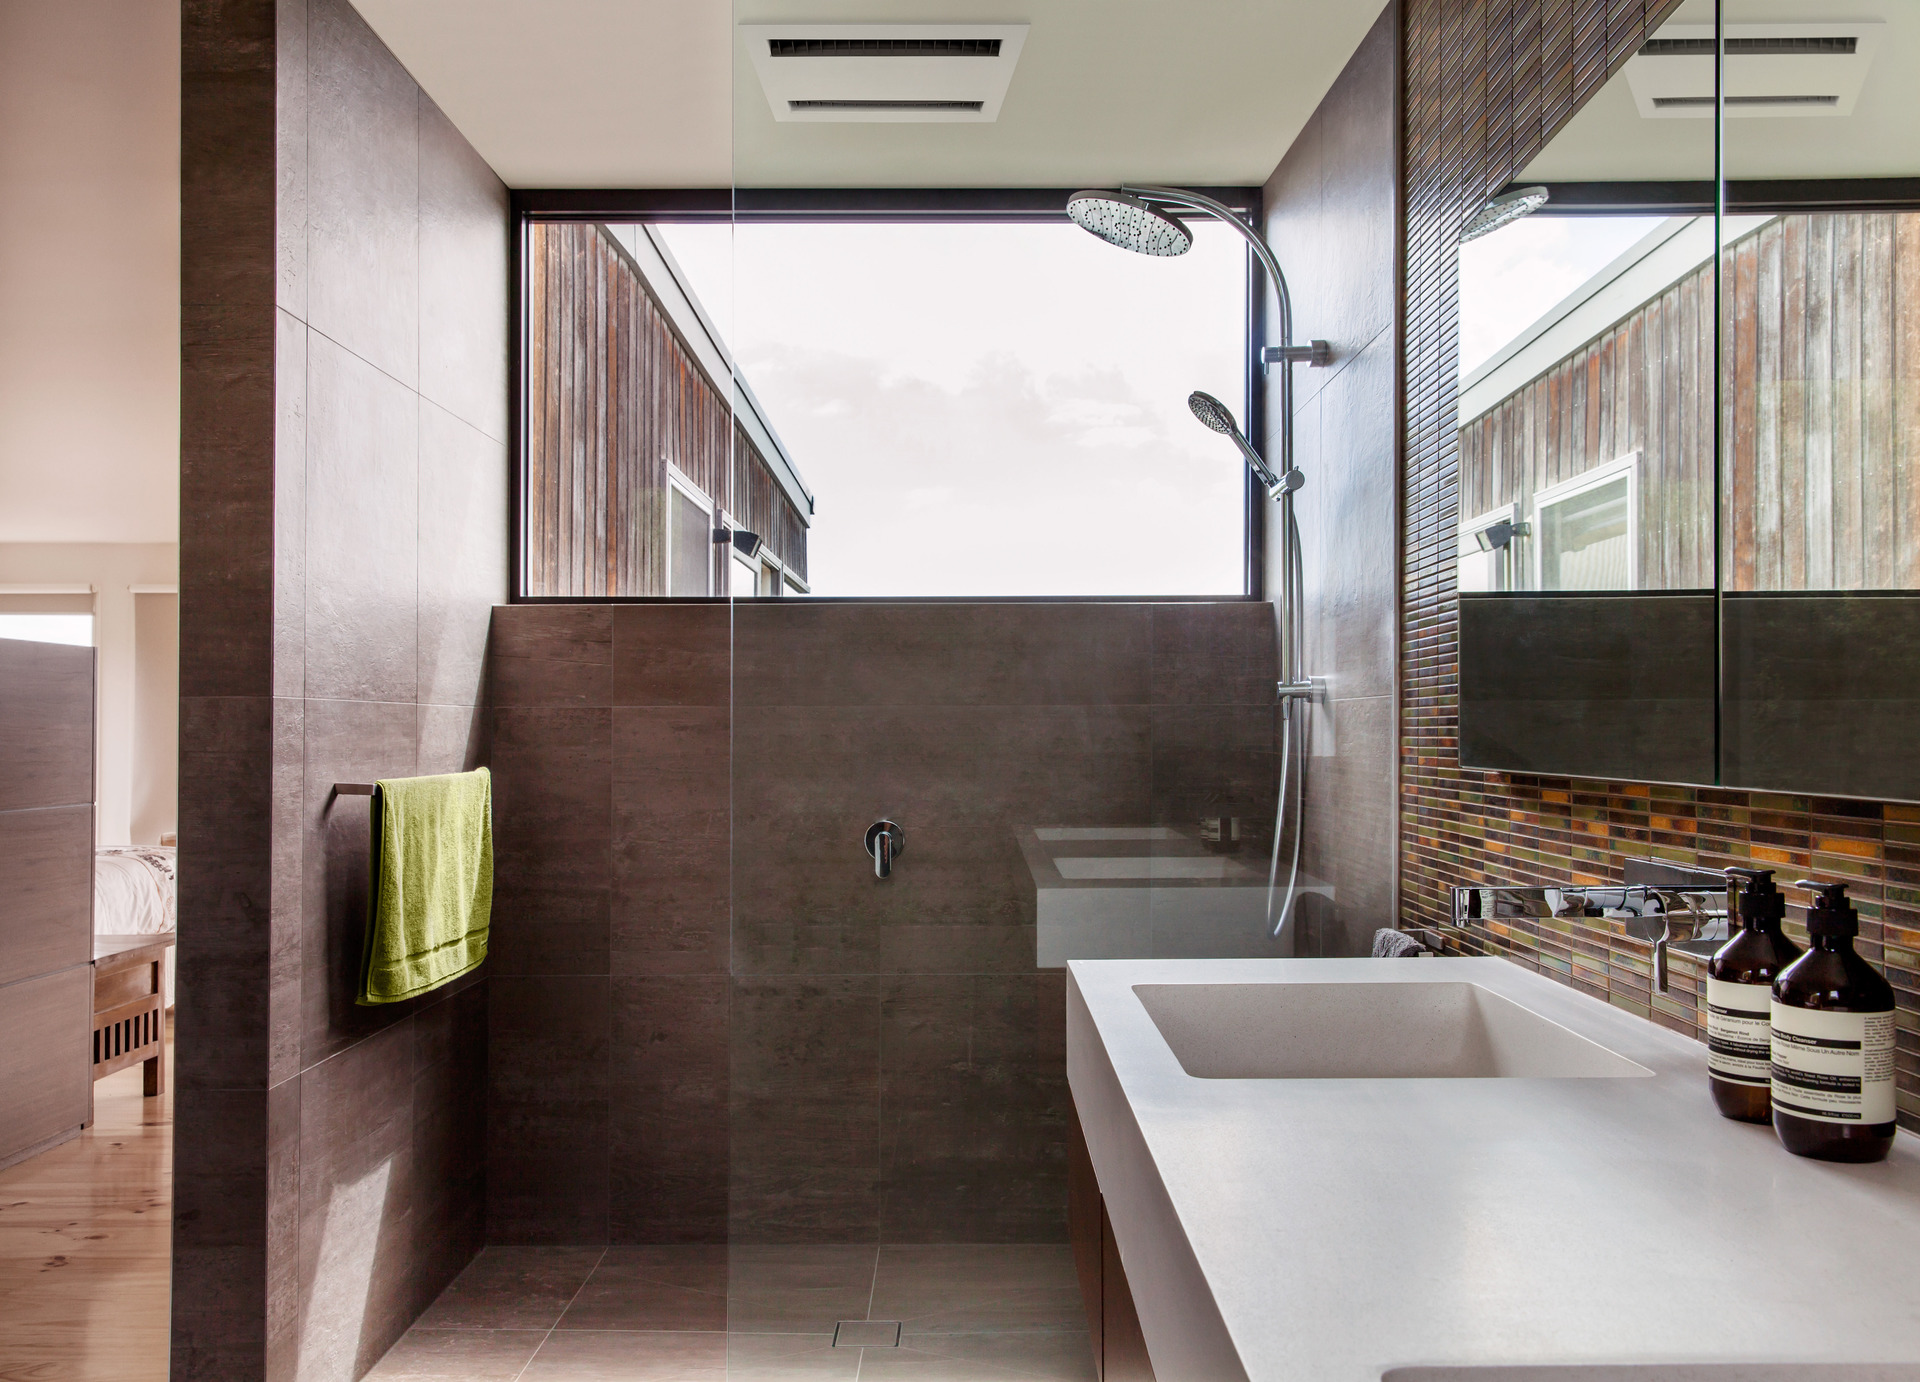 White ixl tastic neo single bathroom 3 in 1 heater exhaust and led - 72dpi 62005ece96 Tastic Neo Module_adele Bates Design Capeschank